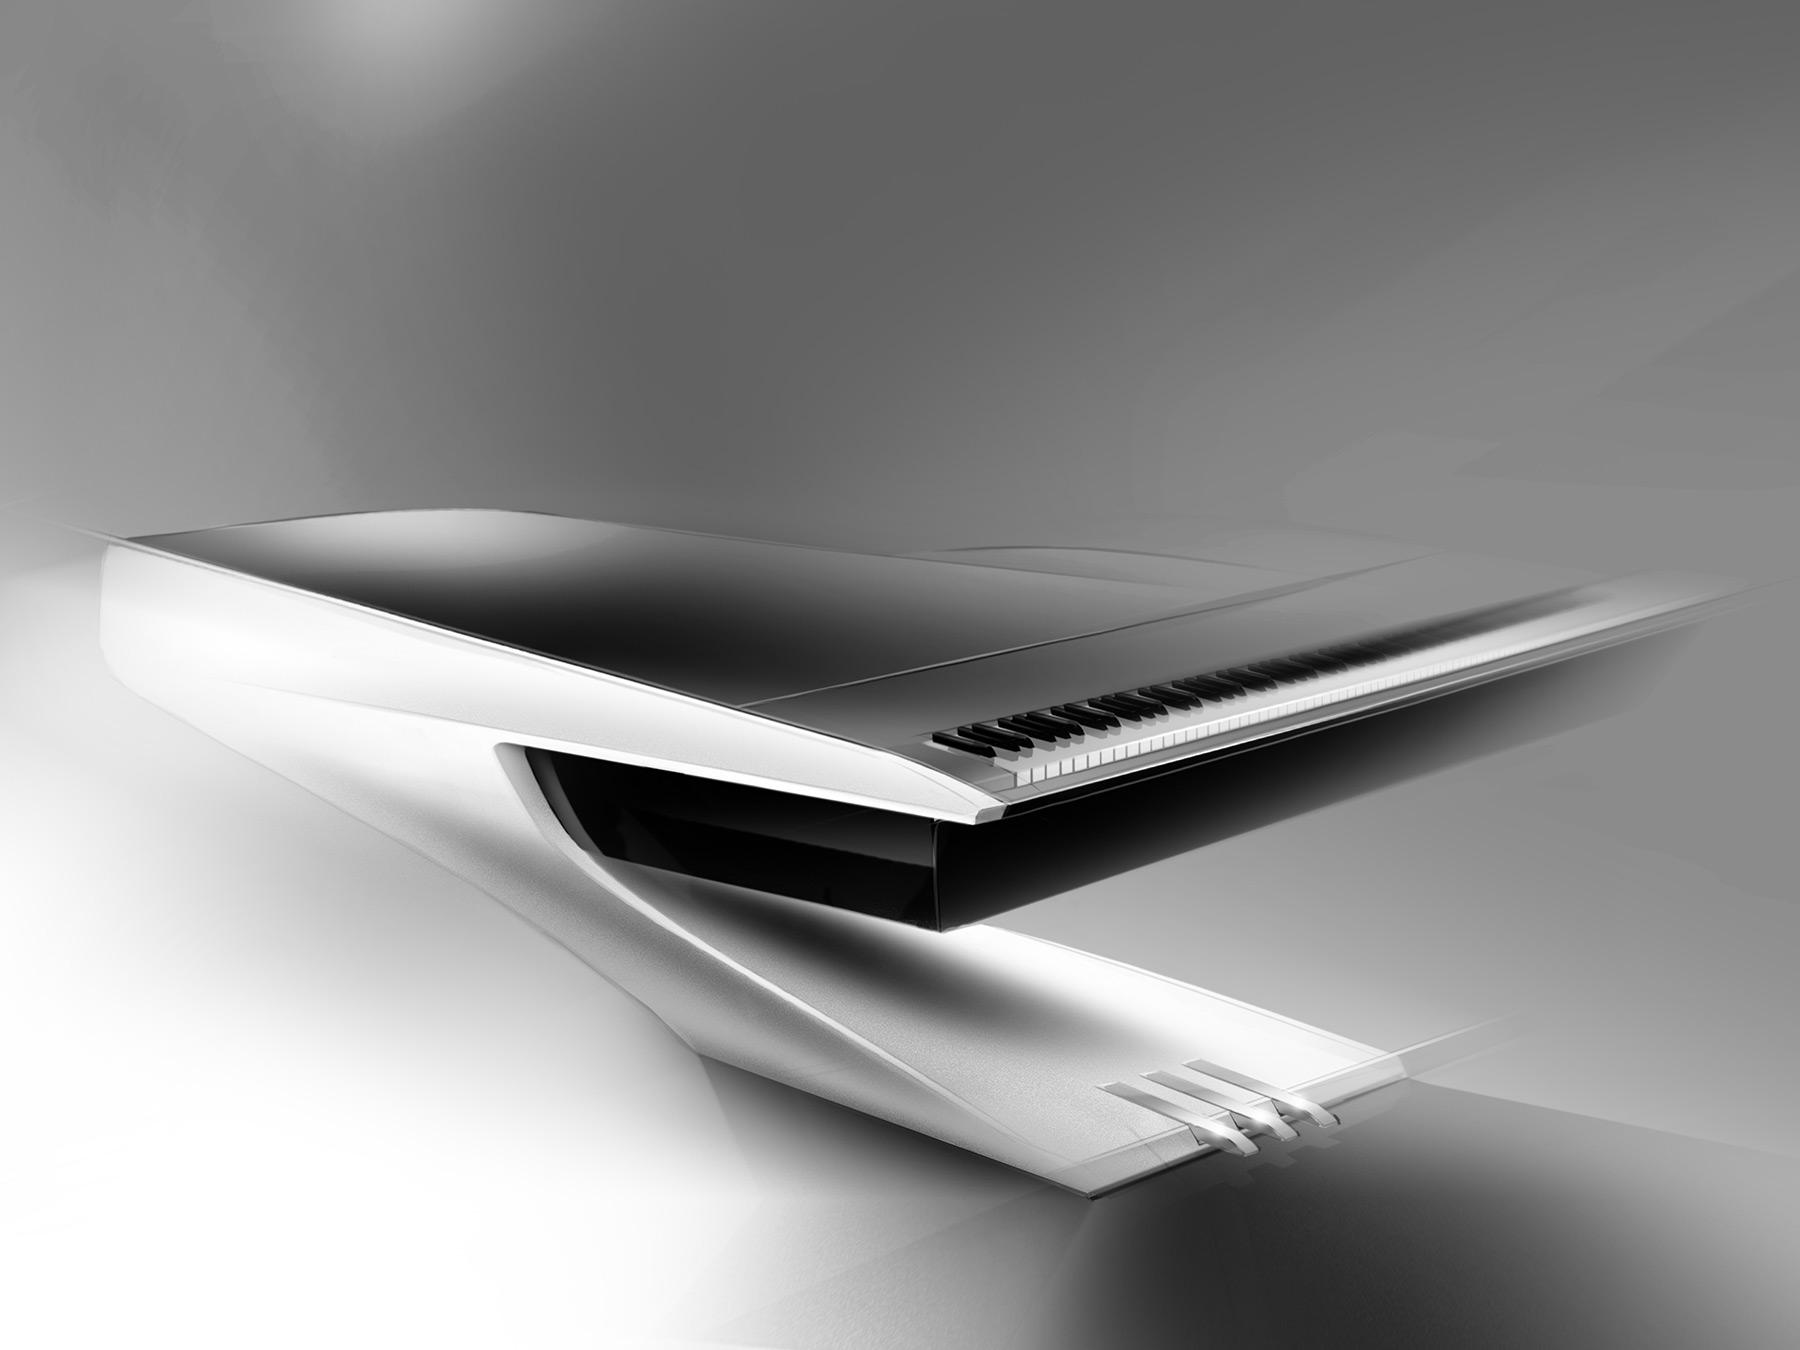 Pleyel piano concept design sketch car body for Yamaha rx v473 manual